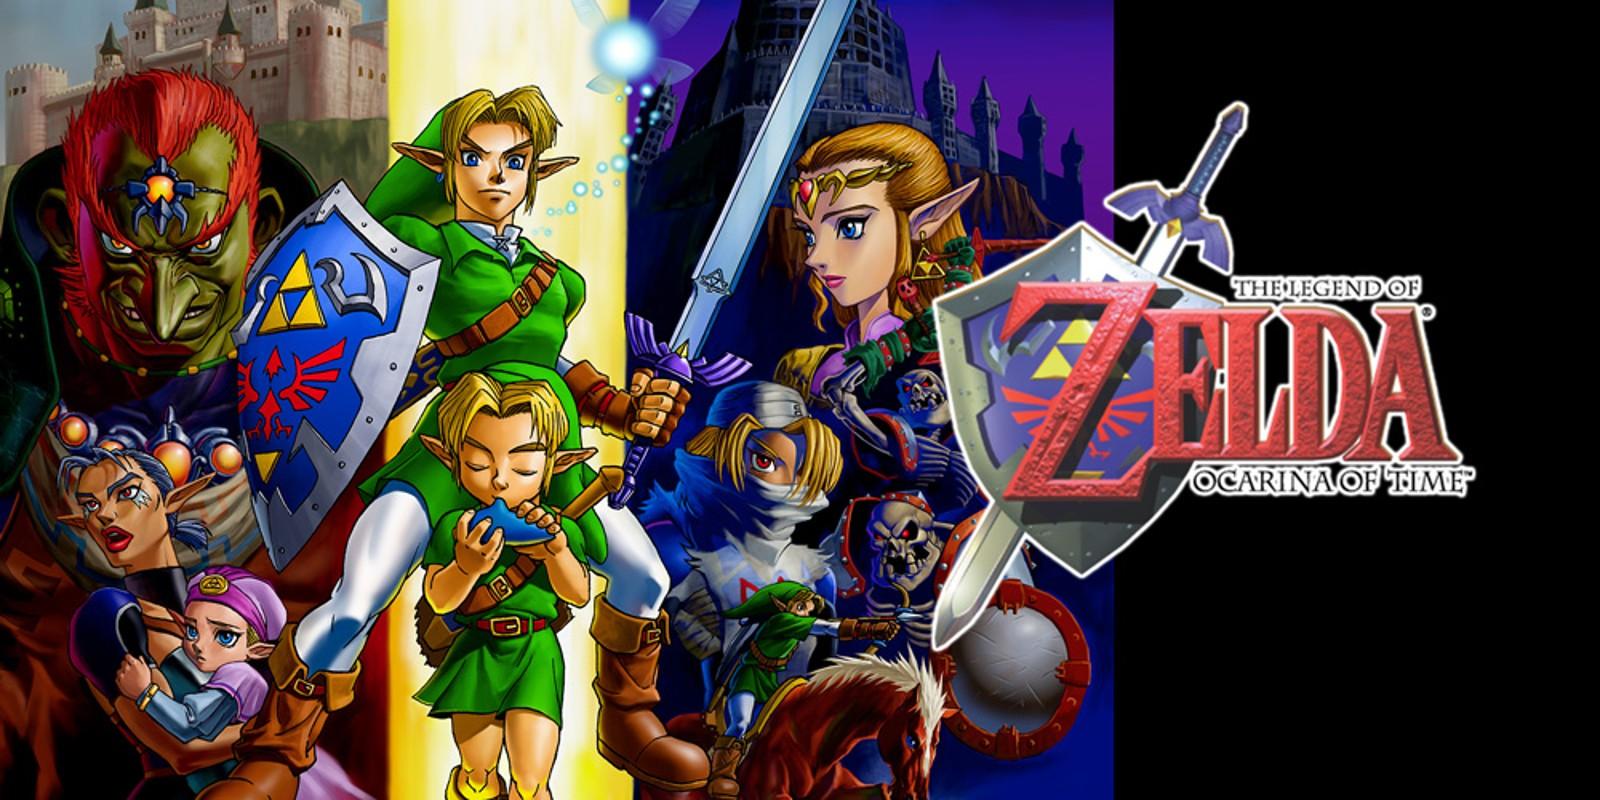 Wii U Legend of Zelda Ocarina of Time